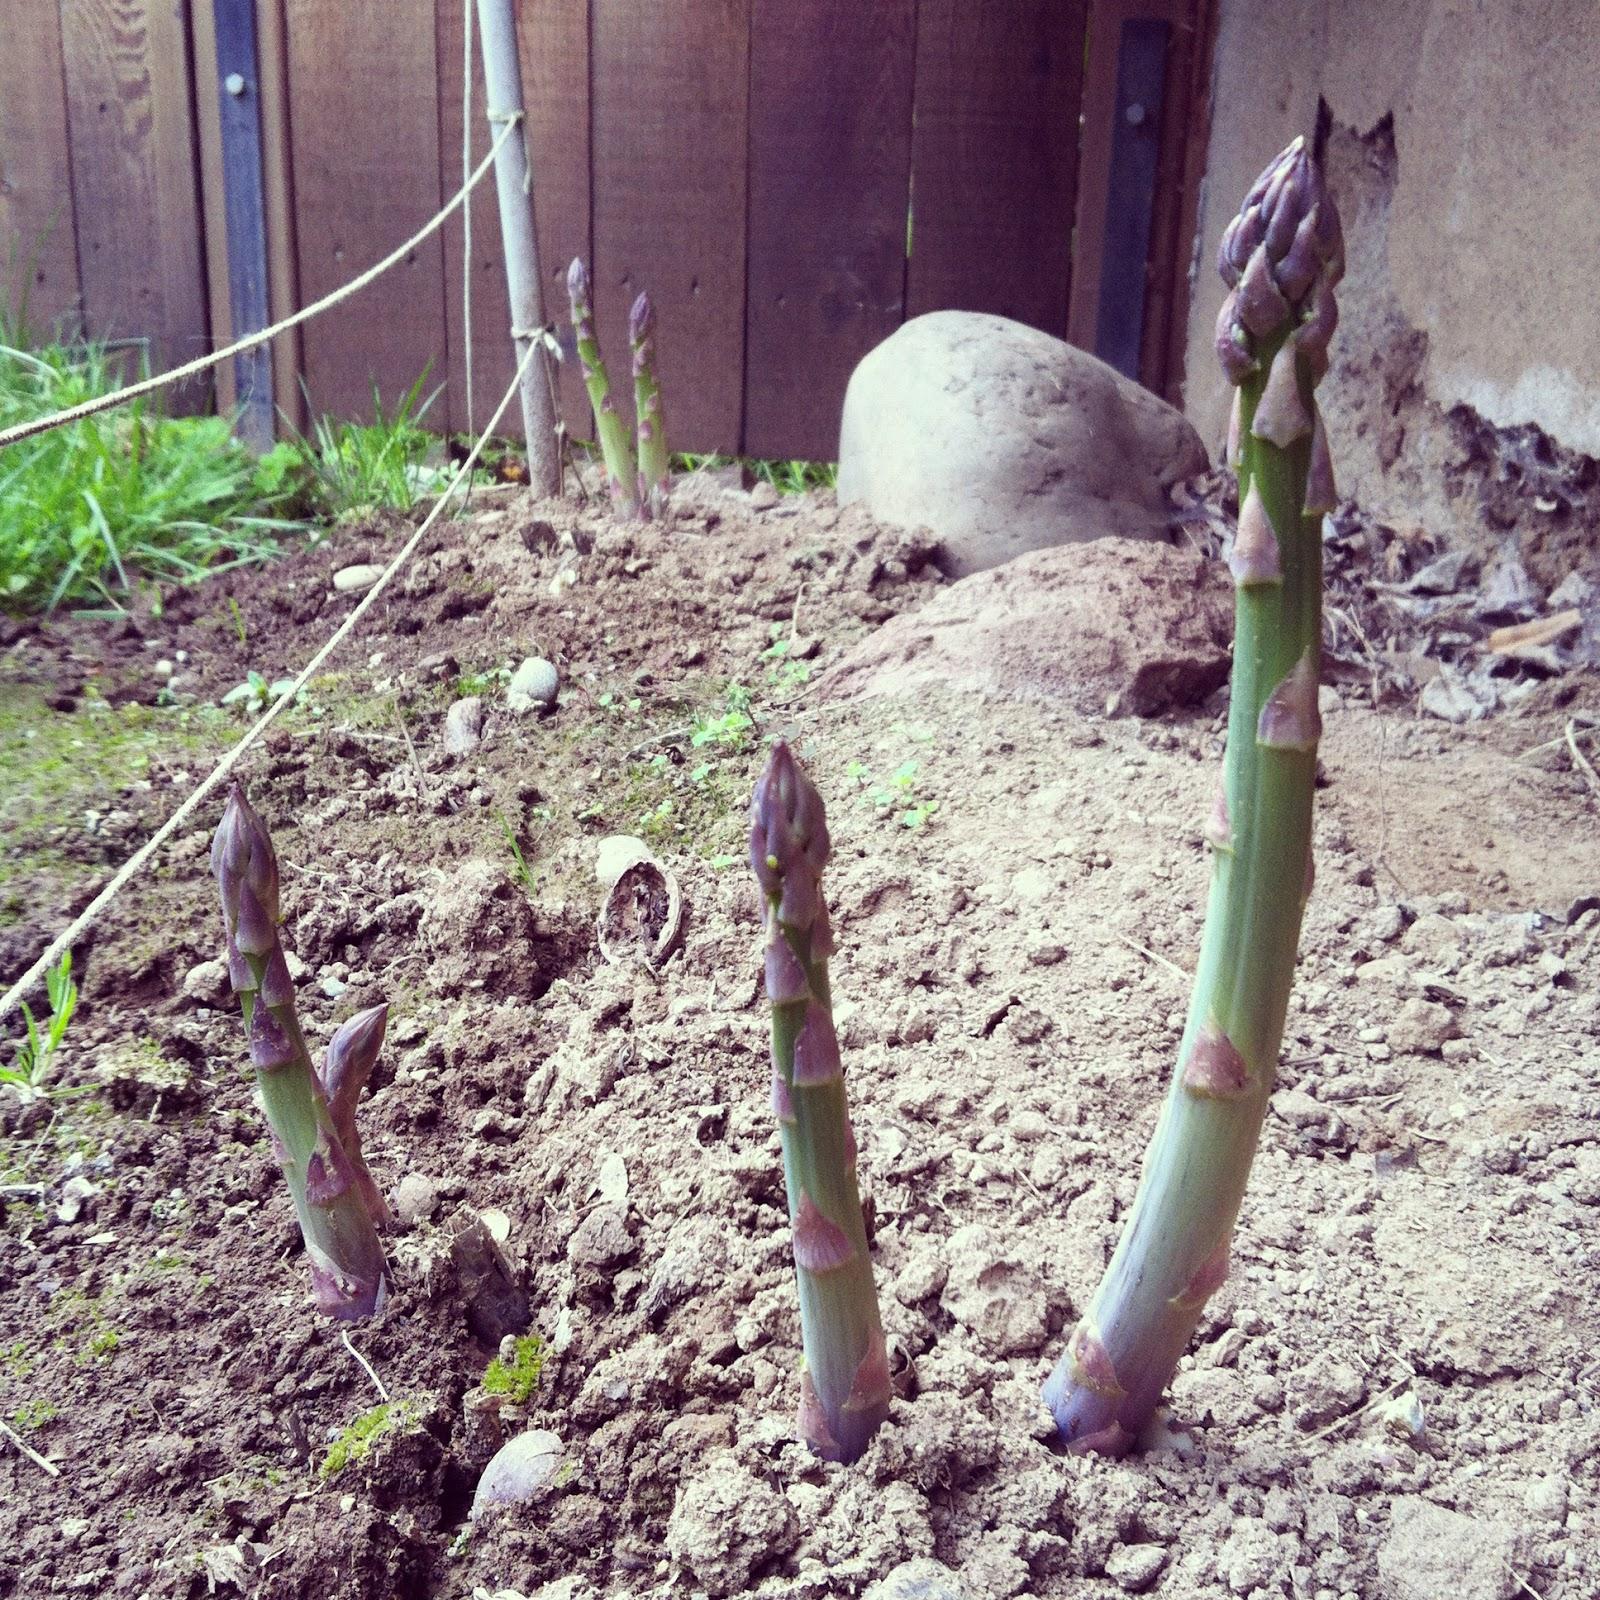 Blue Bamboo Spa Lutz Reviews